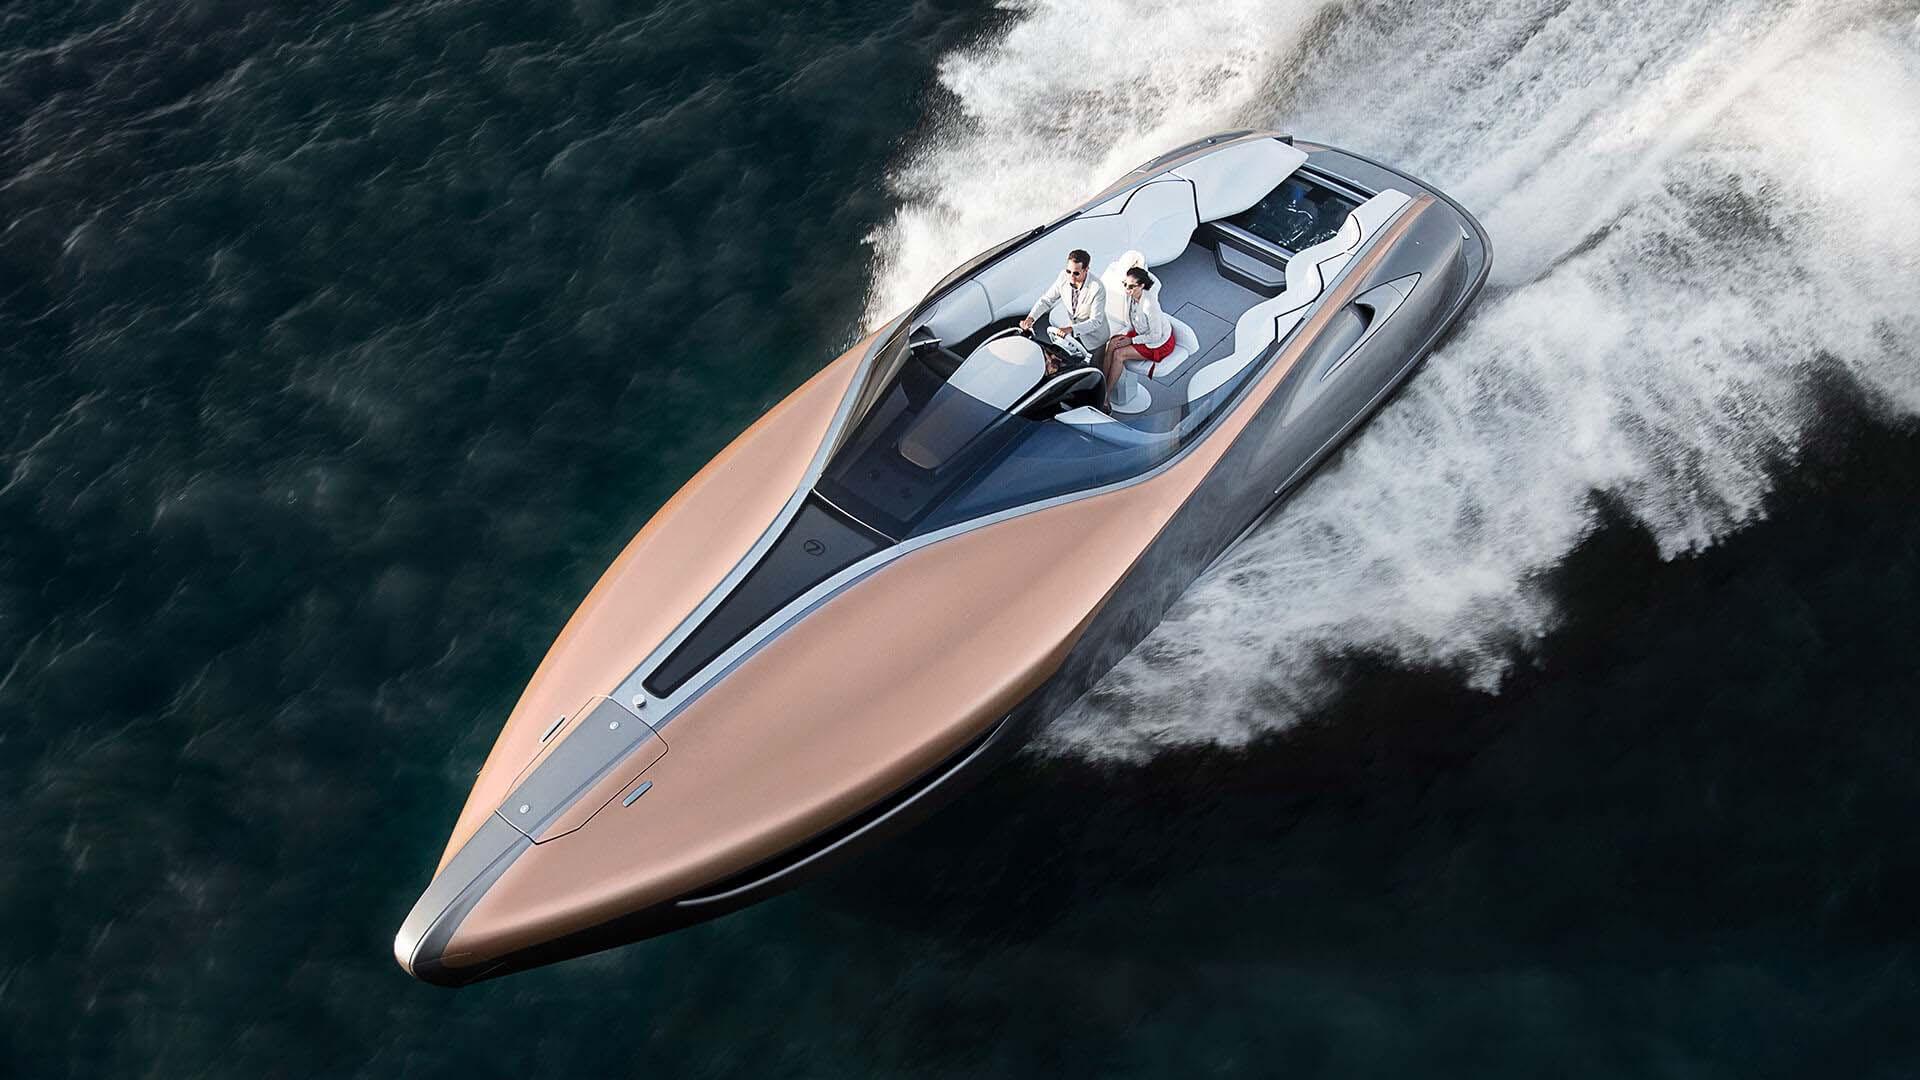 2017 lexus yacht gallery10